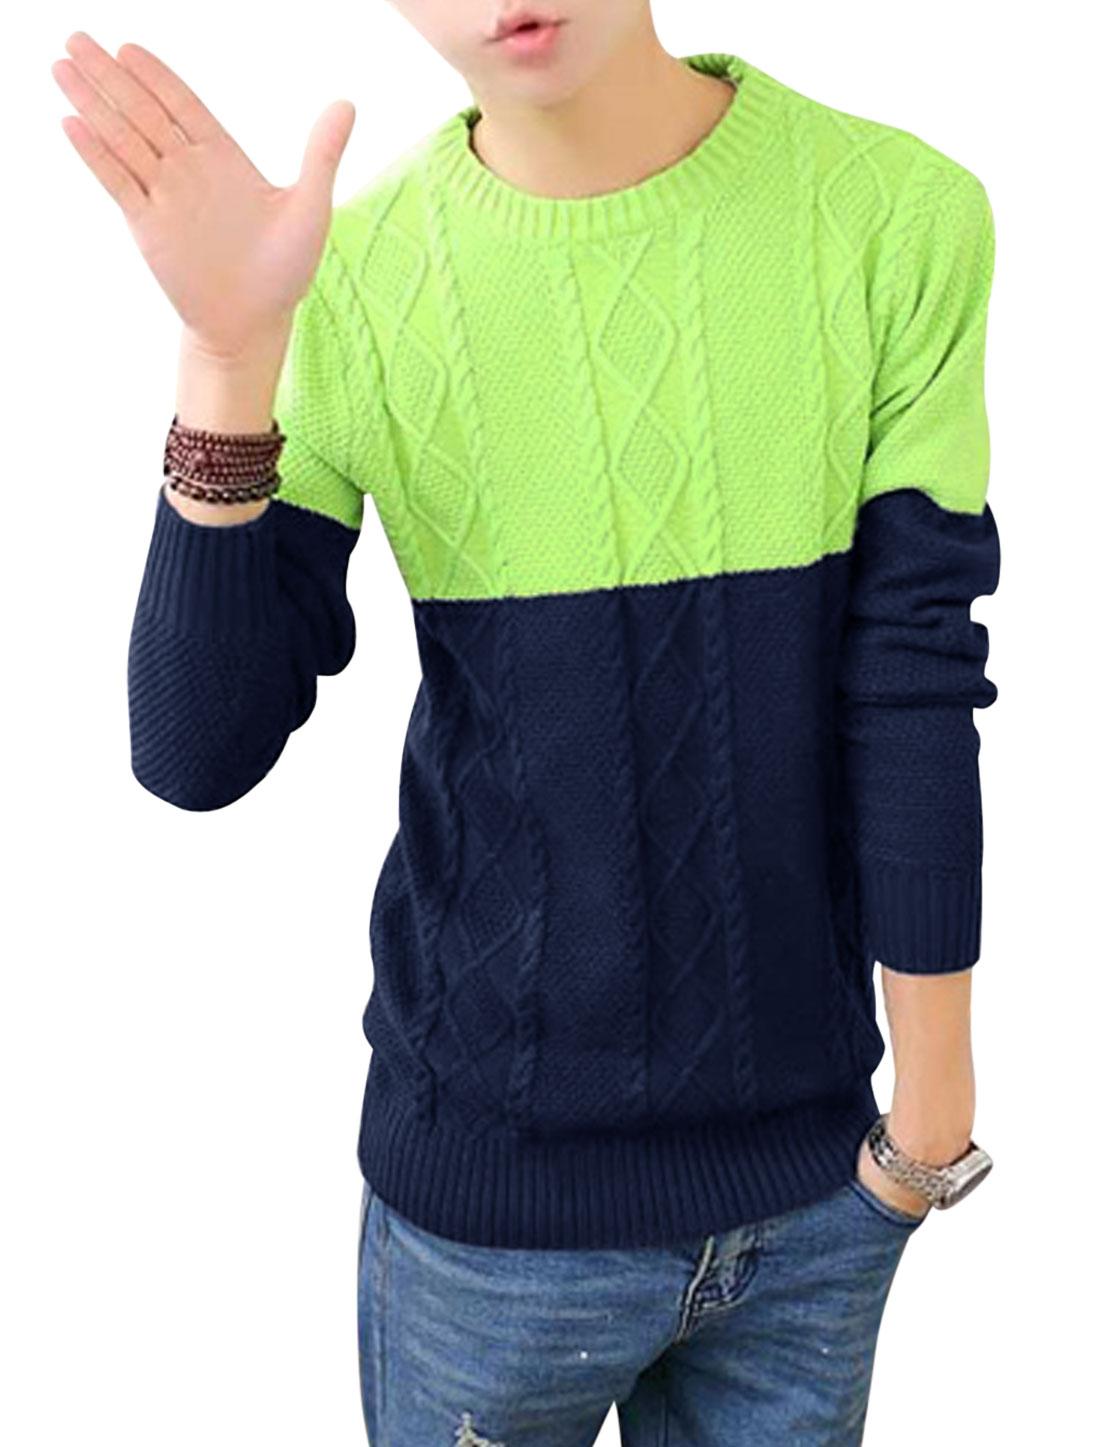 Men Argyle Design Cable Rib Knit Design Colorblock Sweater Green Navy Blue S